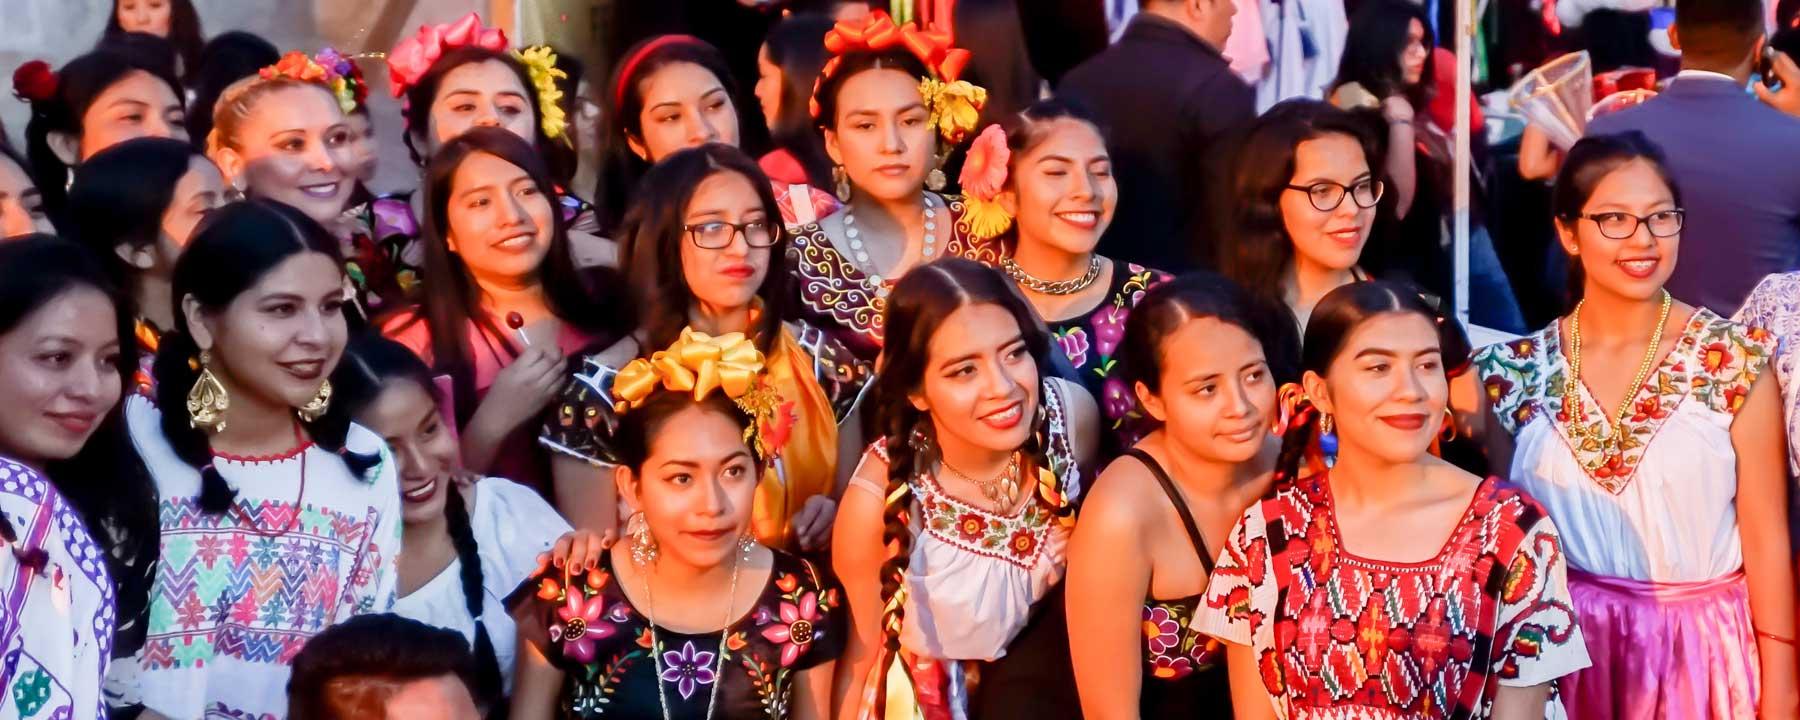 12 Wonderful Spanish Schools In Mexico 2018 Second Half Travels